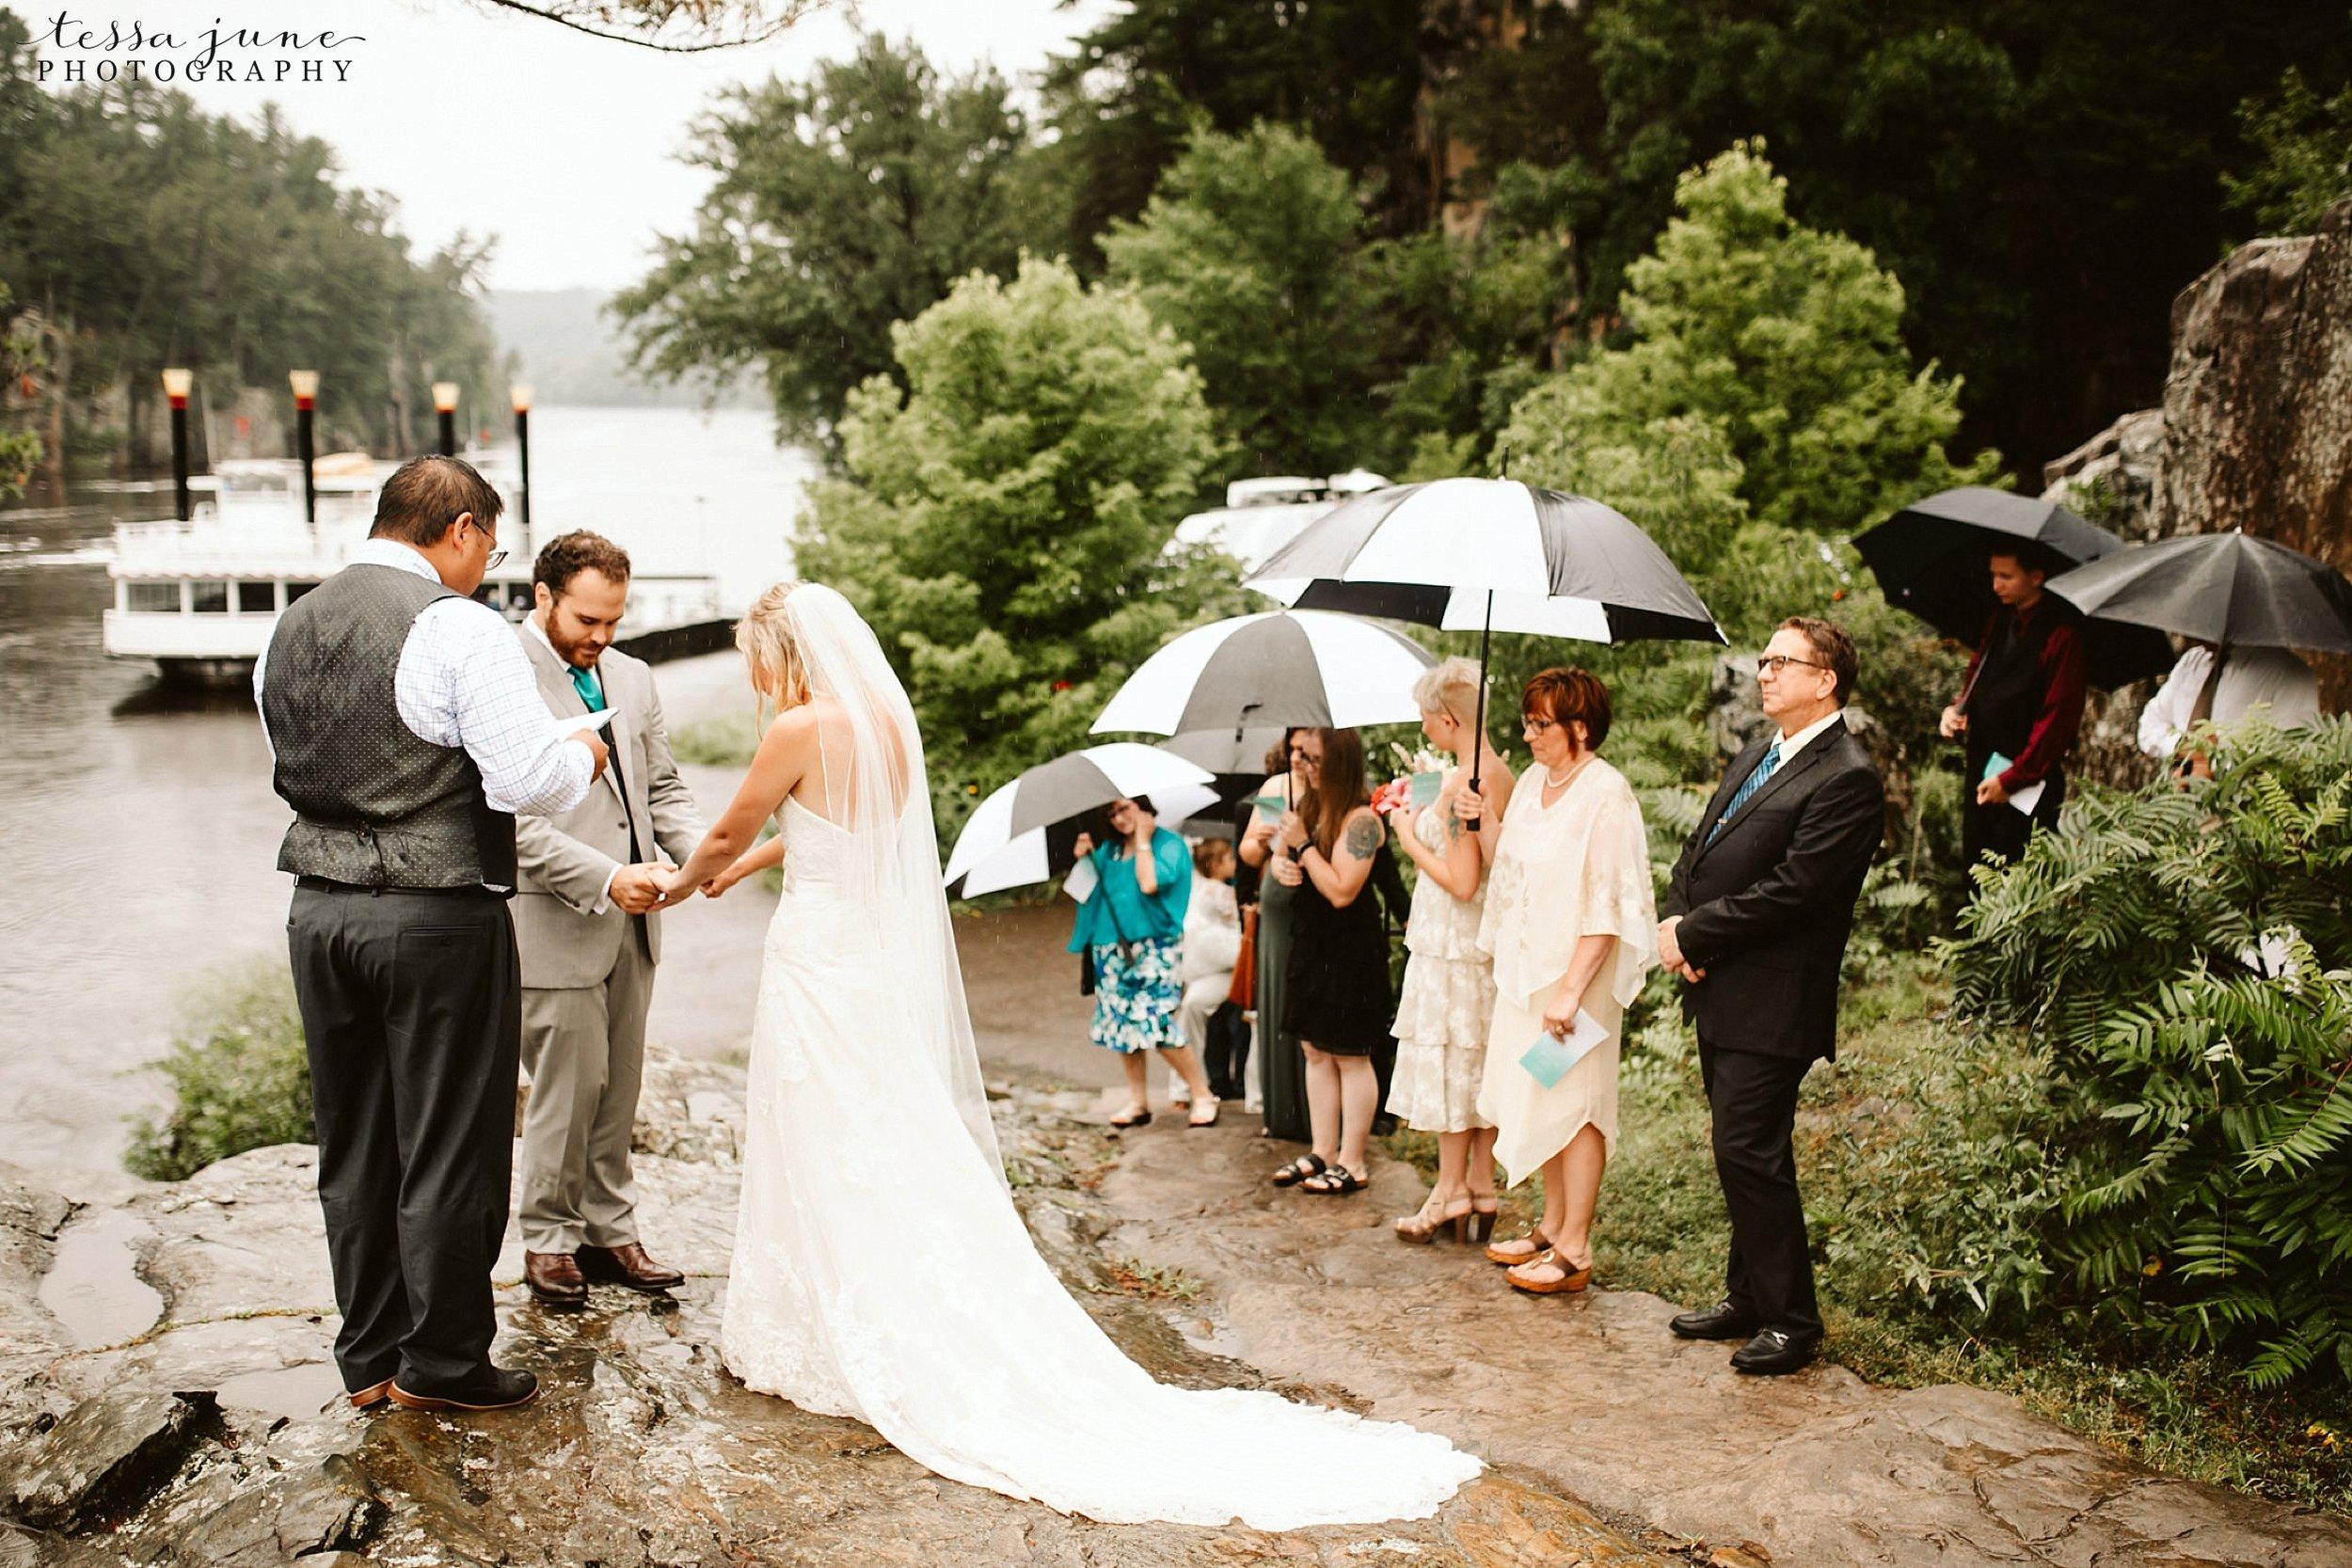 taylors-falls-rainy-elopement-wedding-interstate-state-park-49.jpg